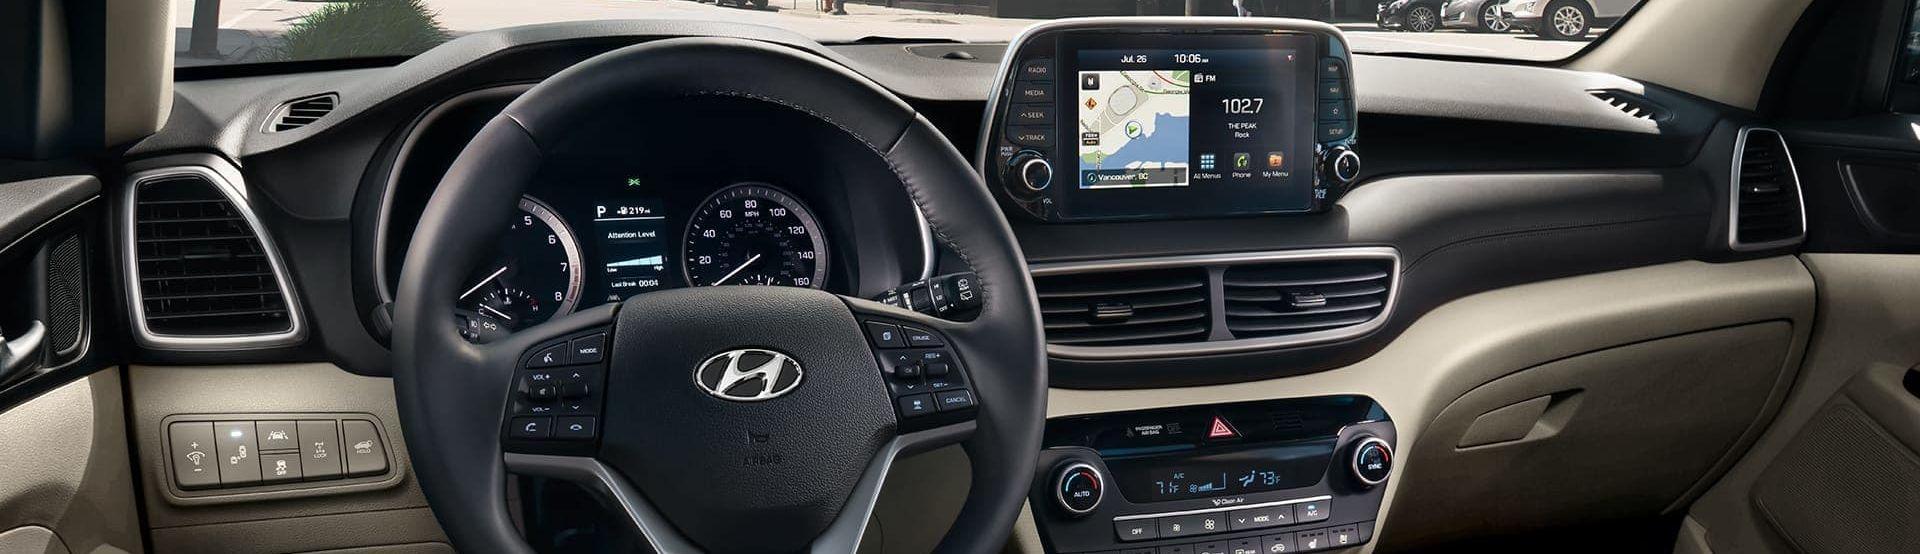 2019 Hyundai Tuscon Center Stack